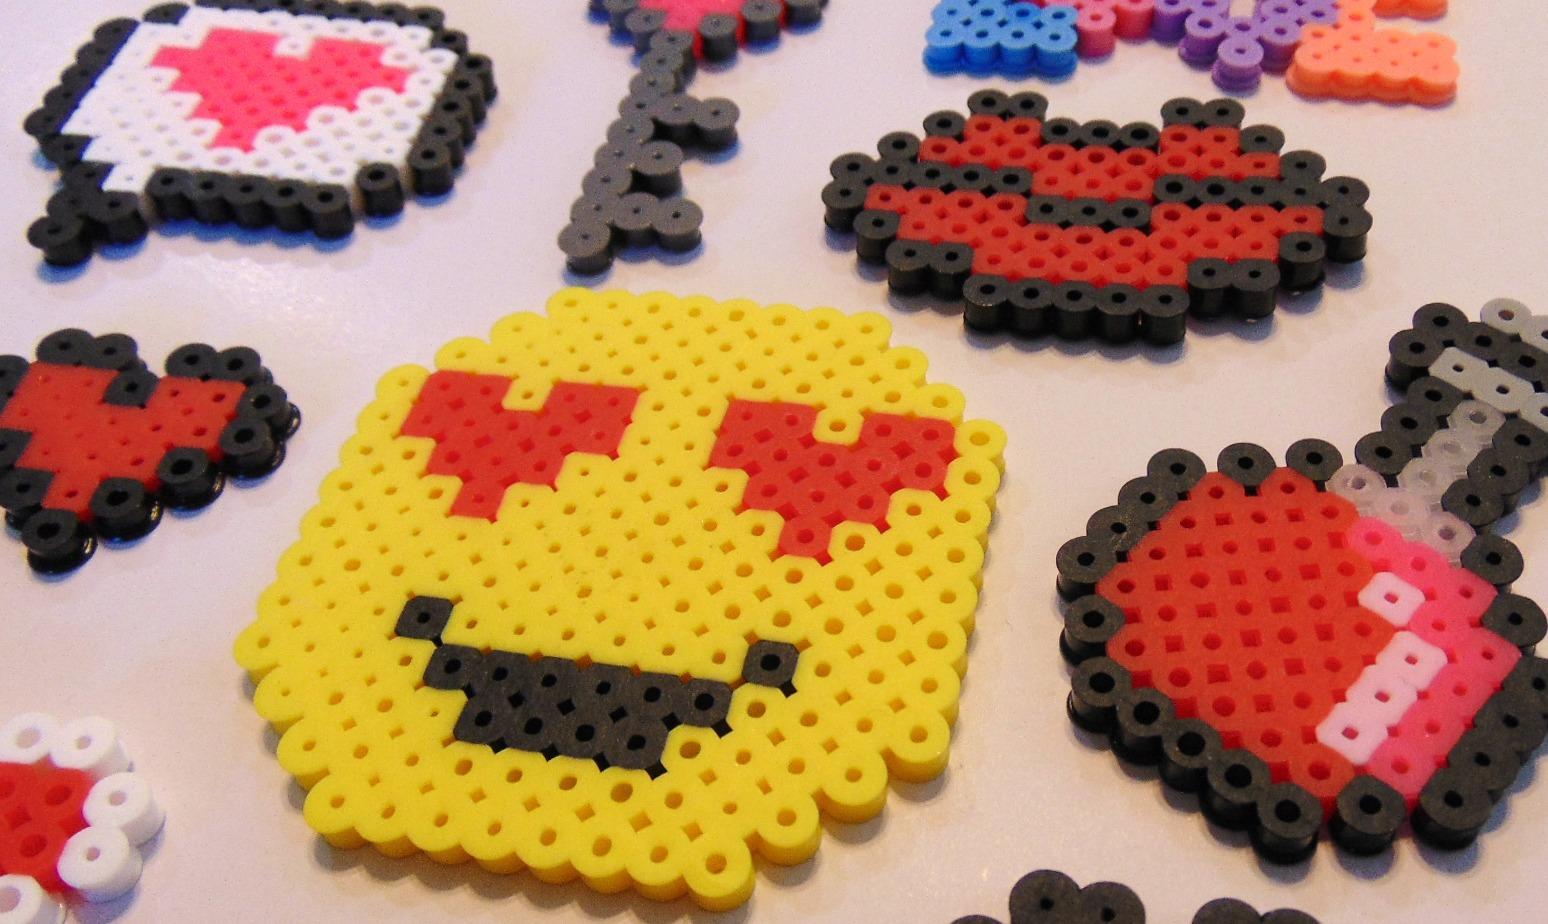 10 Easy Valentine Perler Bead Patterns Krysanthe,How To Design A Database